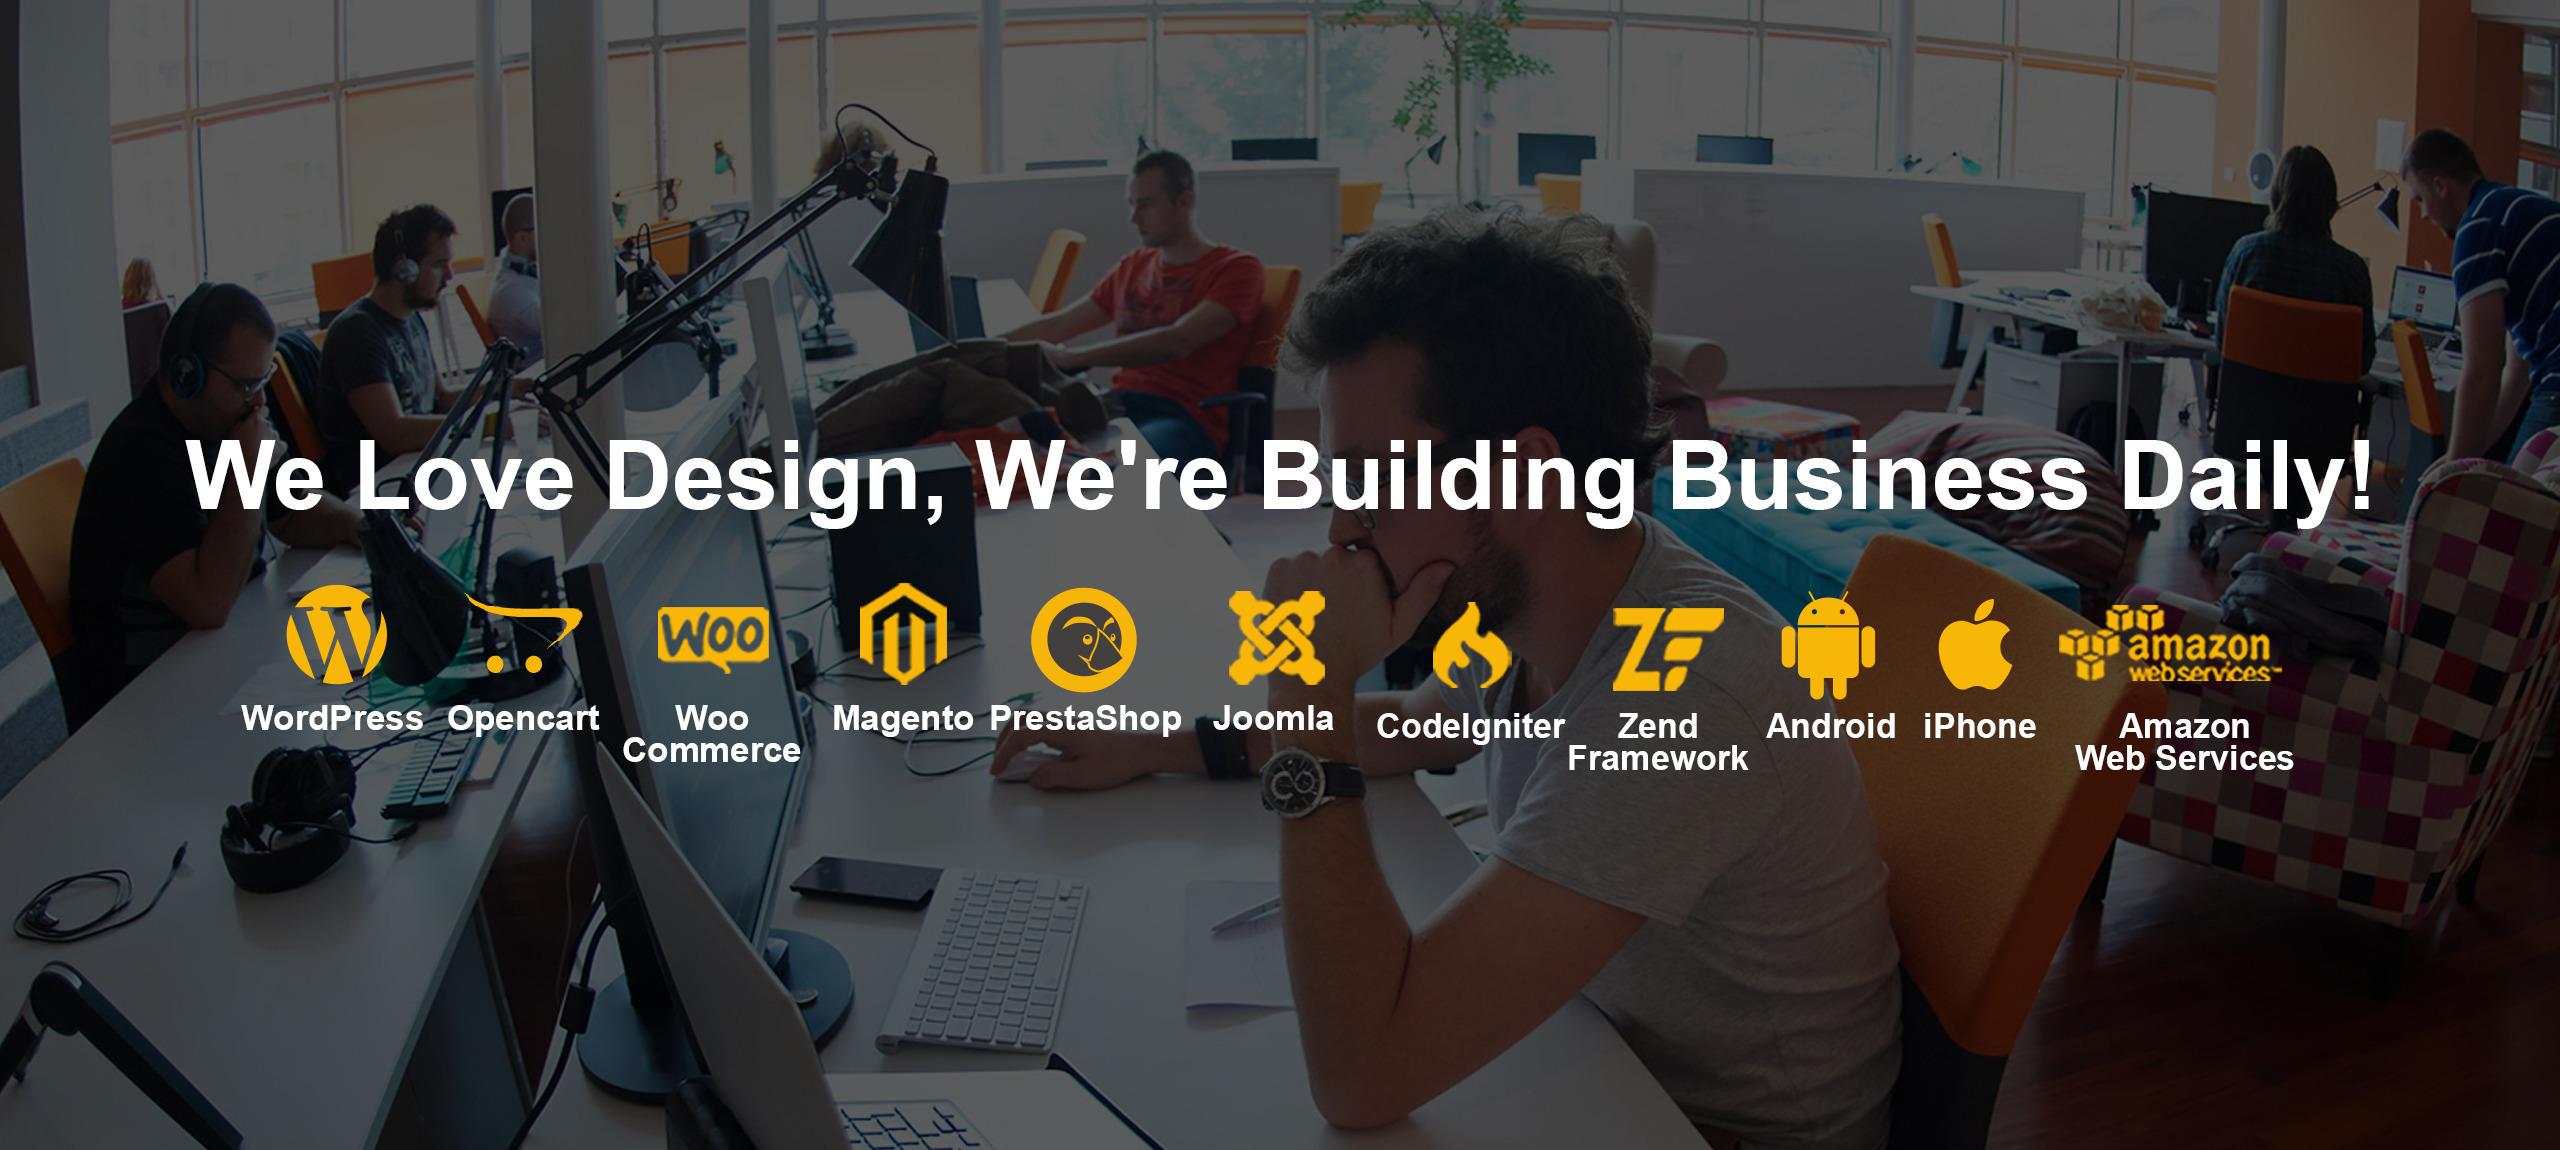 Authorselvi - Web and Mobile Development Company (@authorselvi) Cover Image